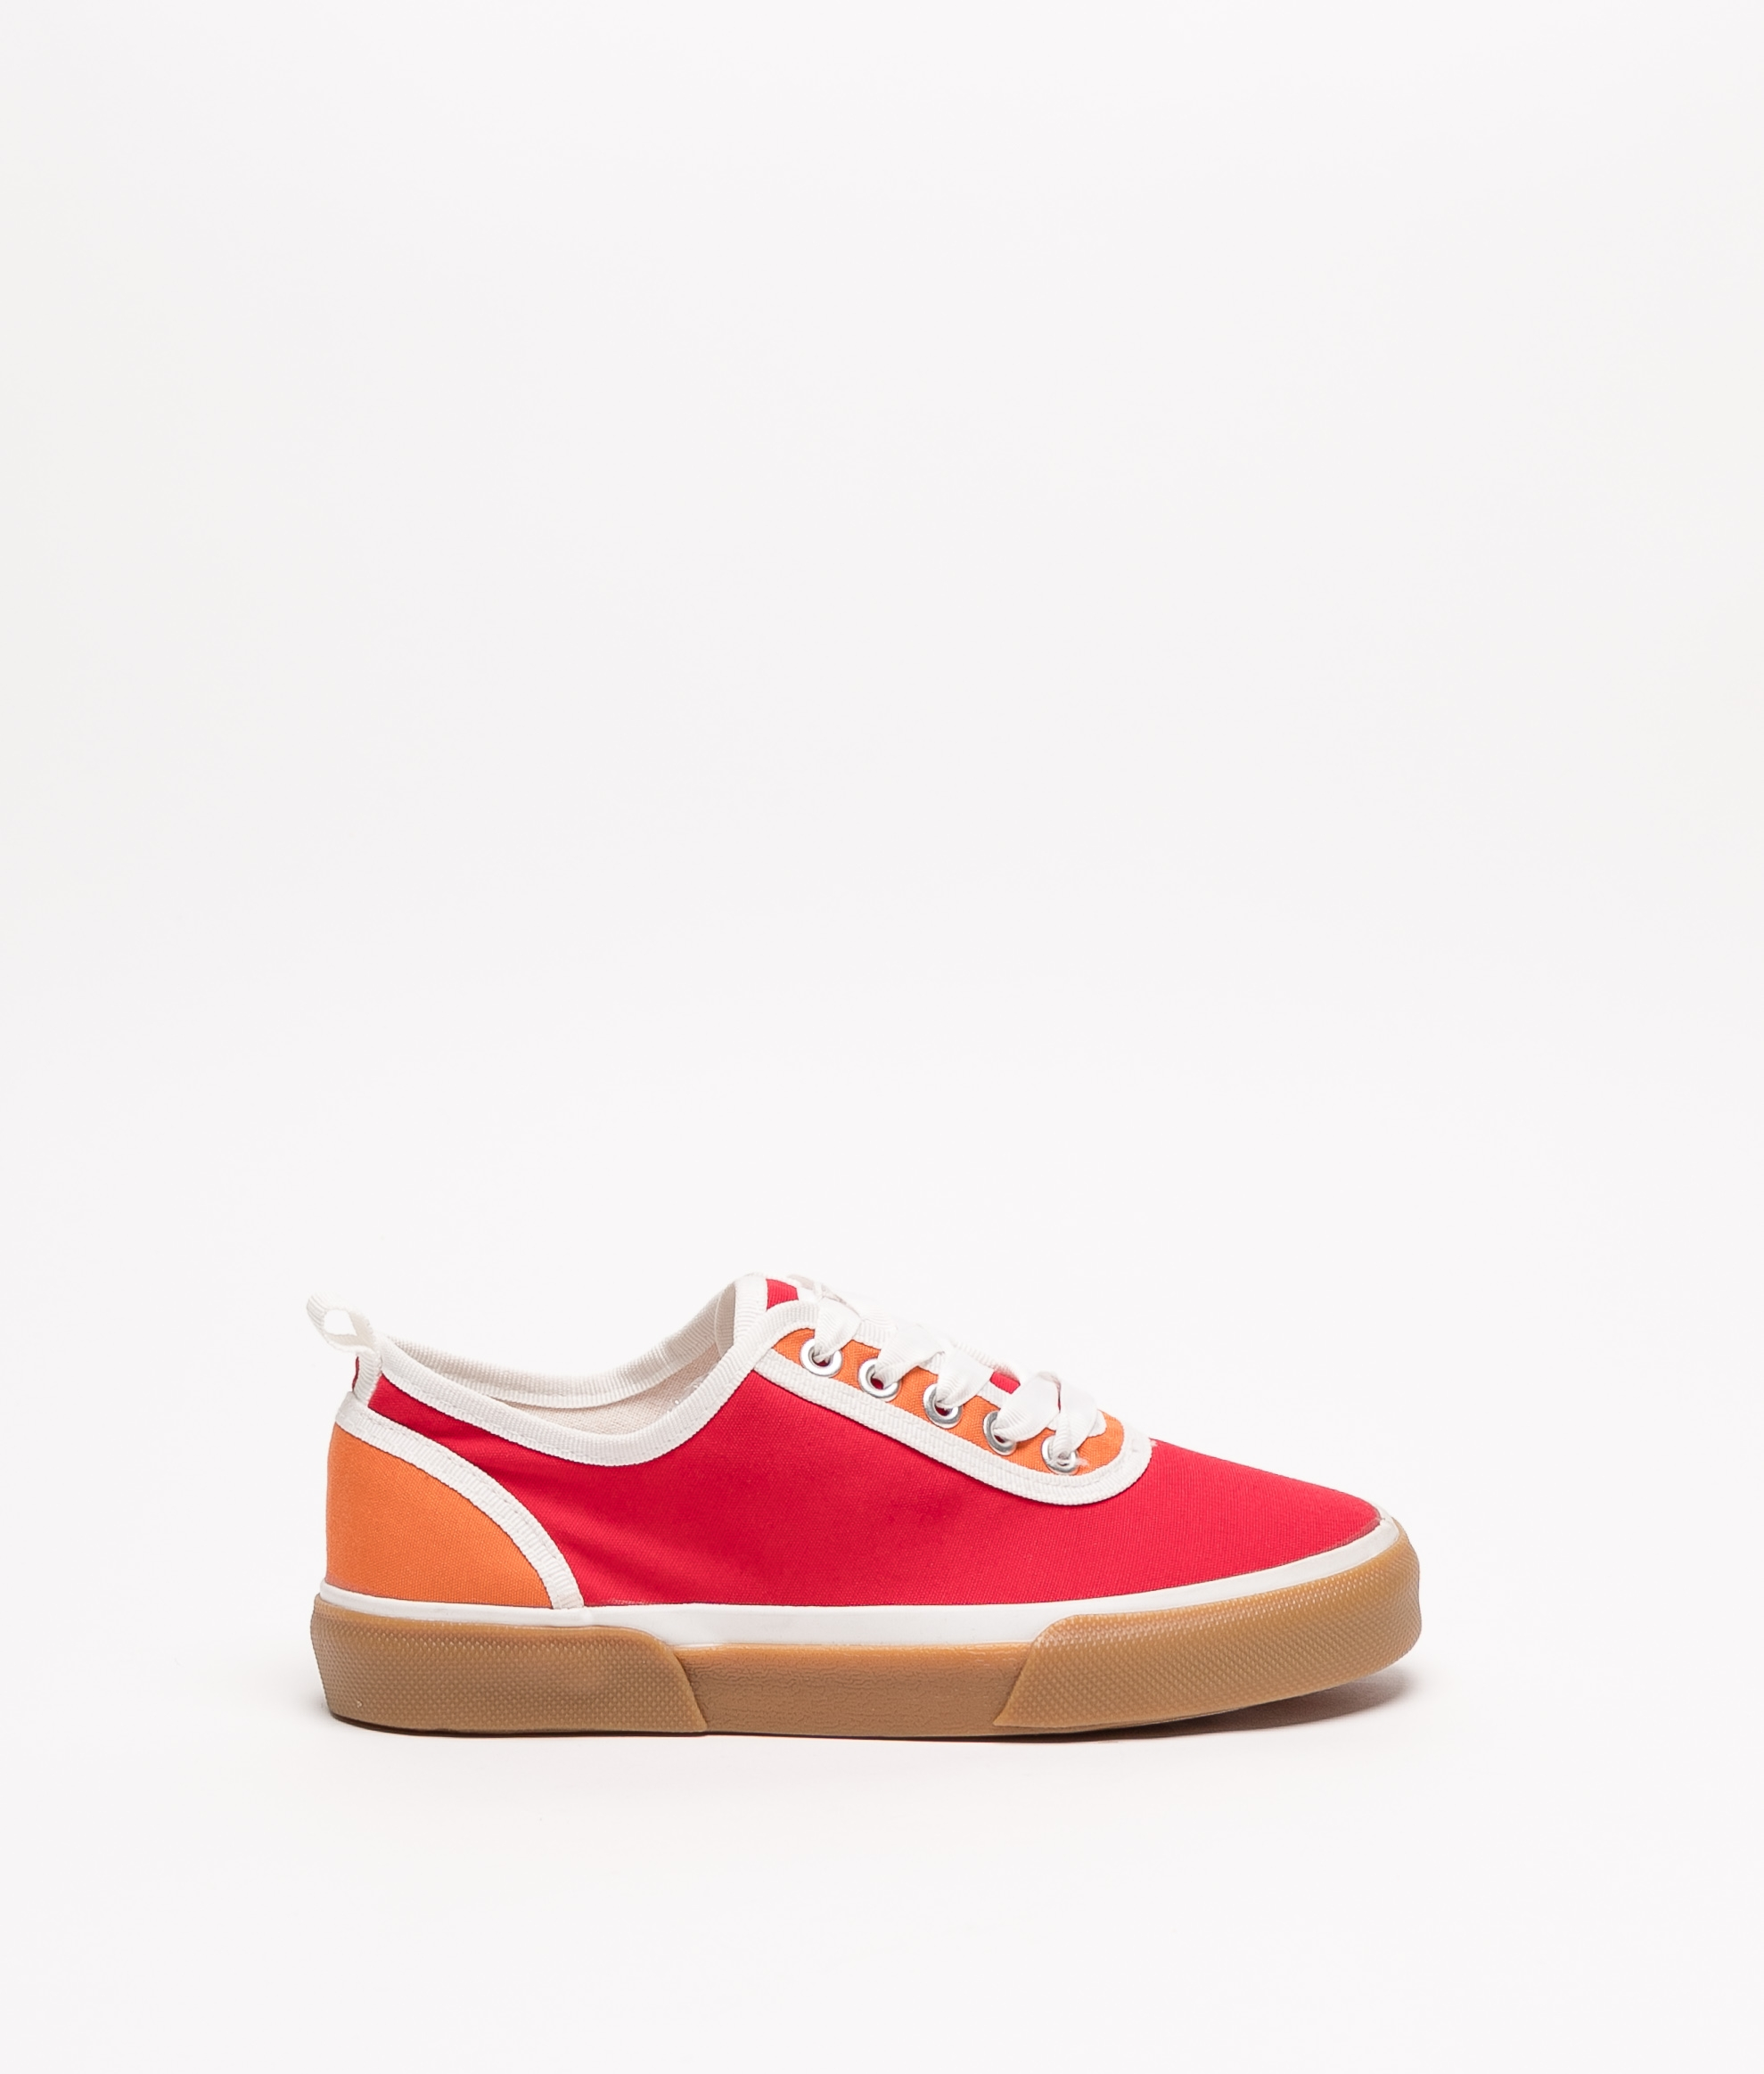 Sneakers Kineli - Rojo